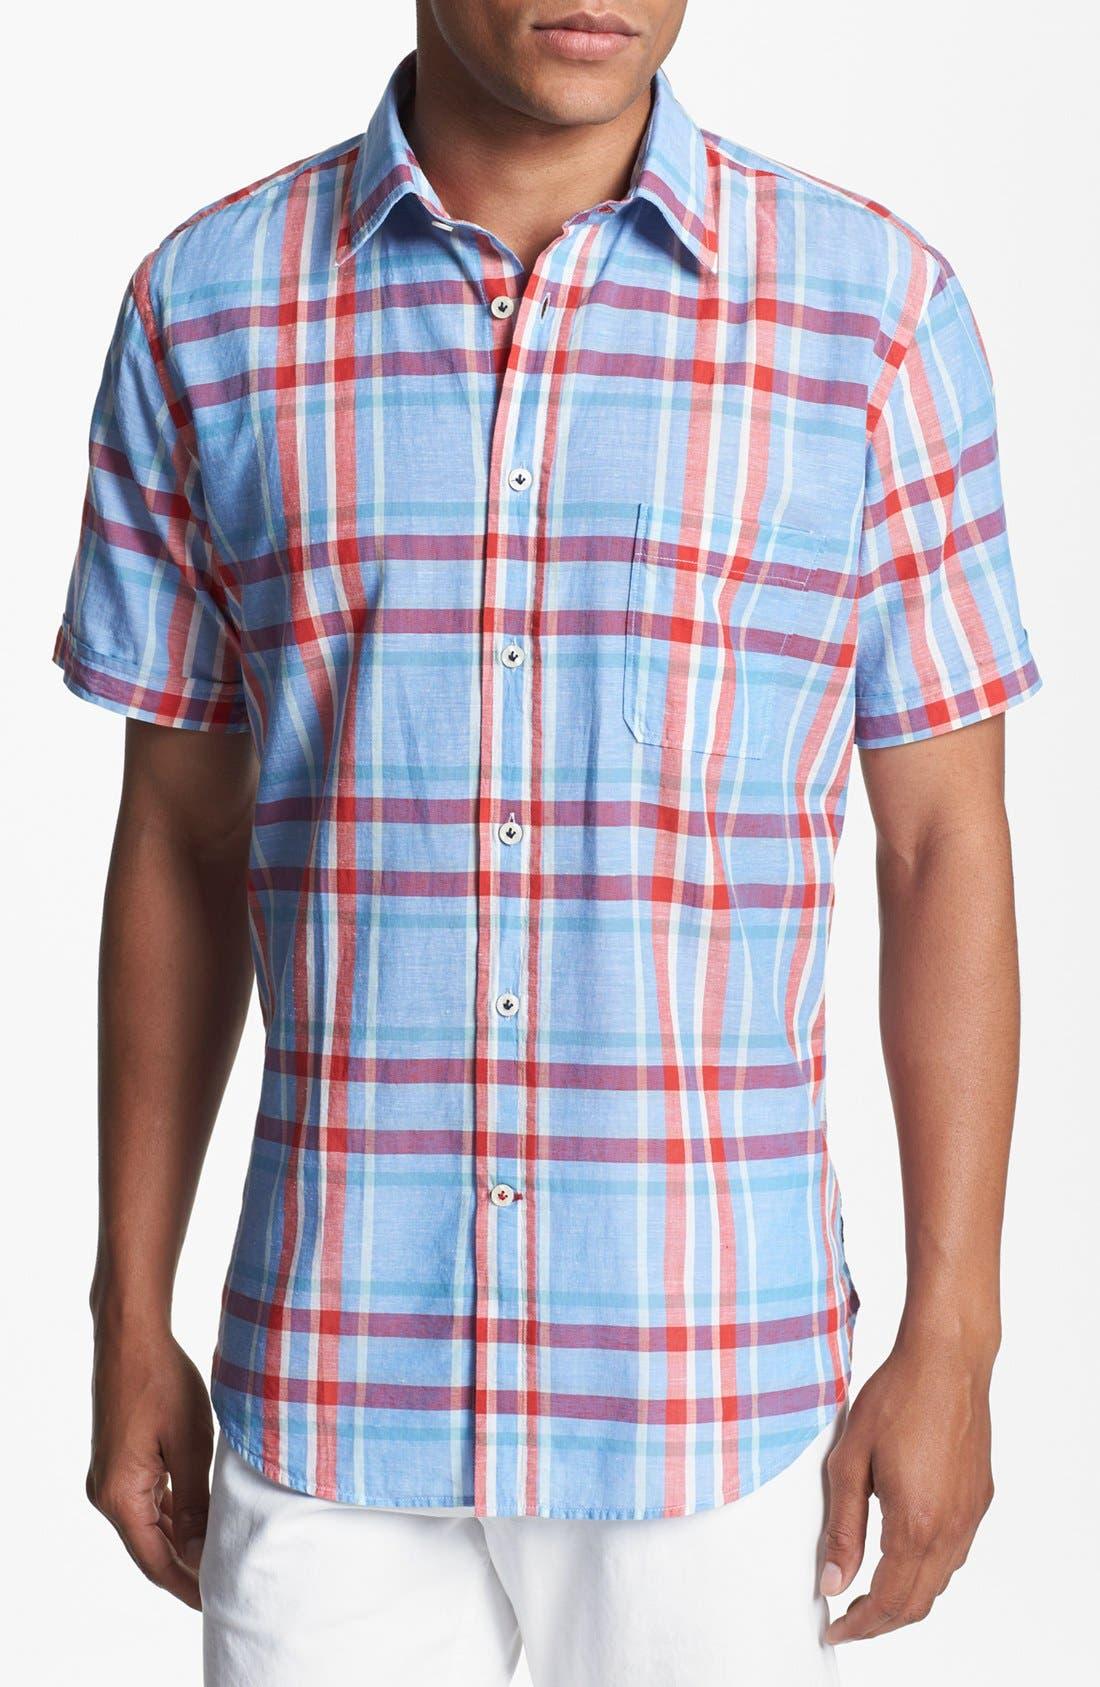 Alternate Image 1 Selected - Benson Plaid Short Sleeve Sport Shirt